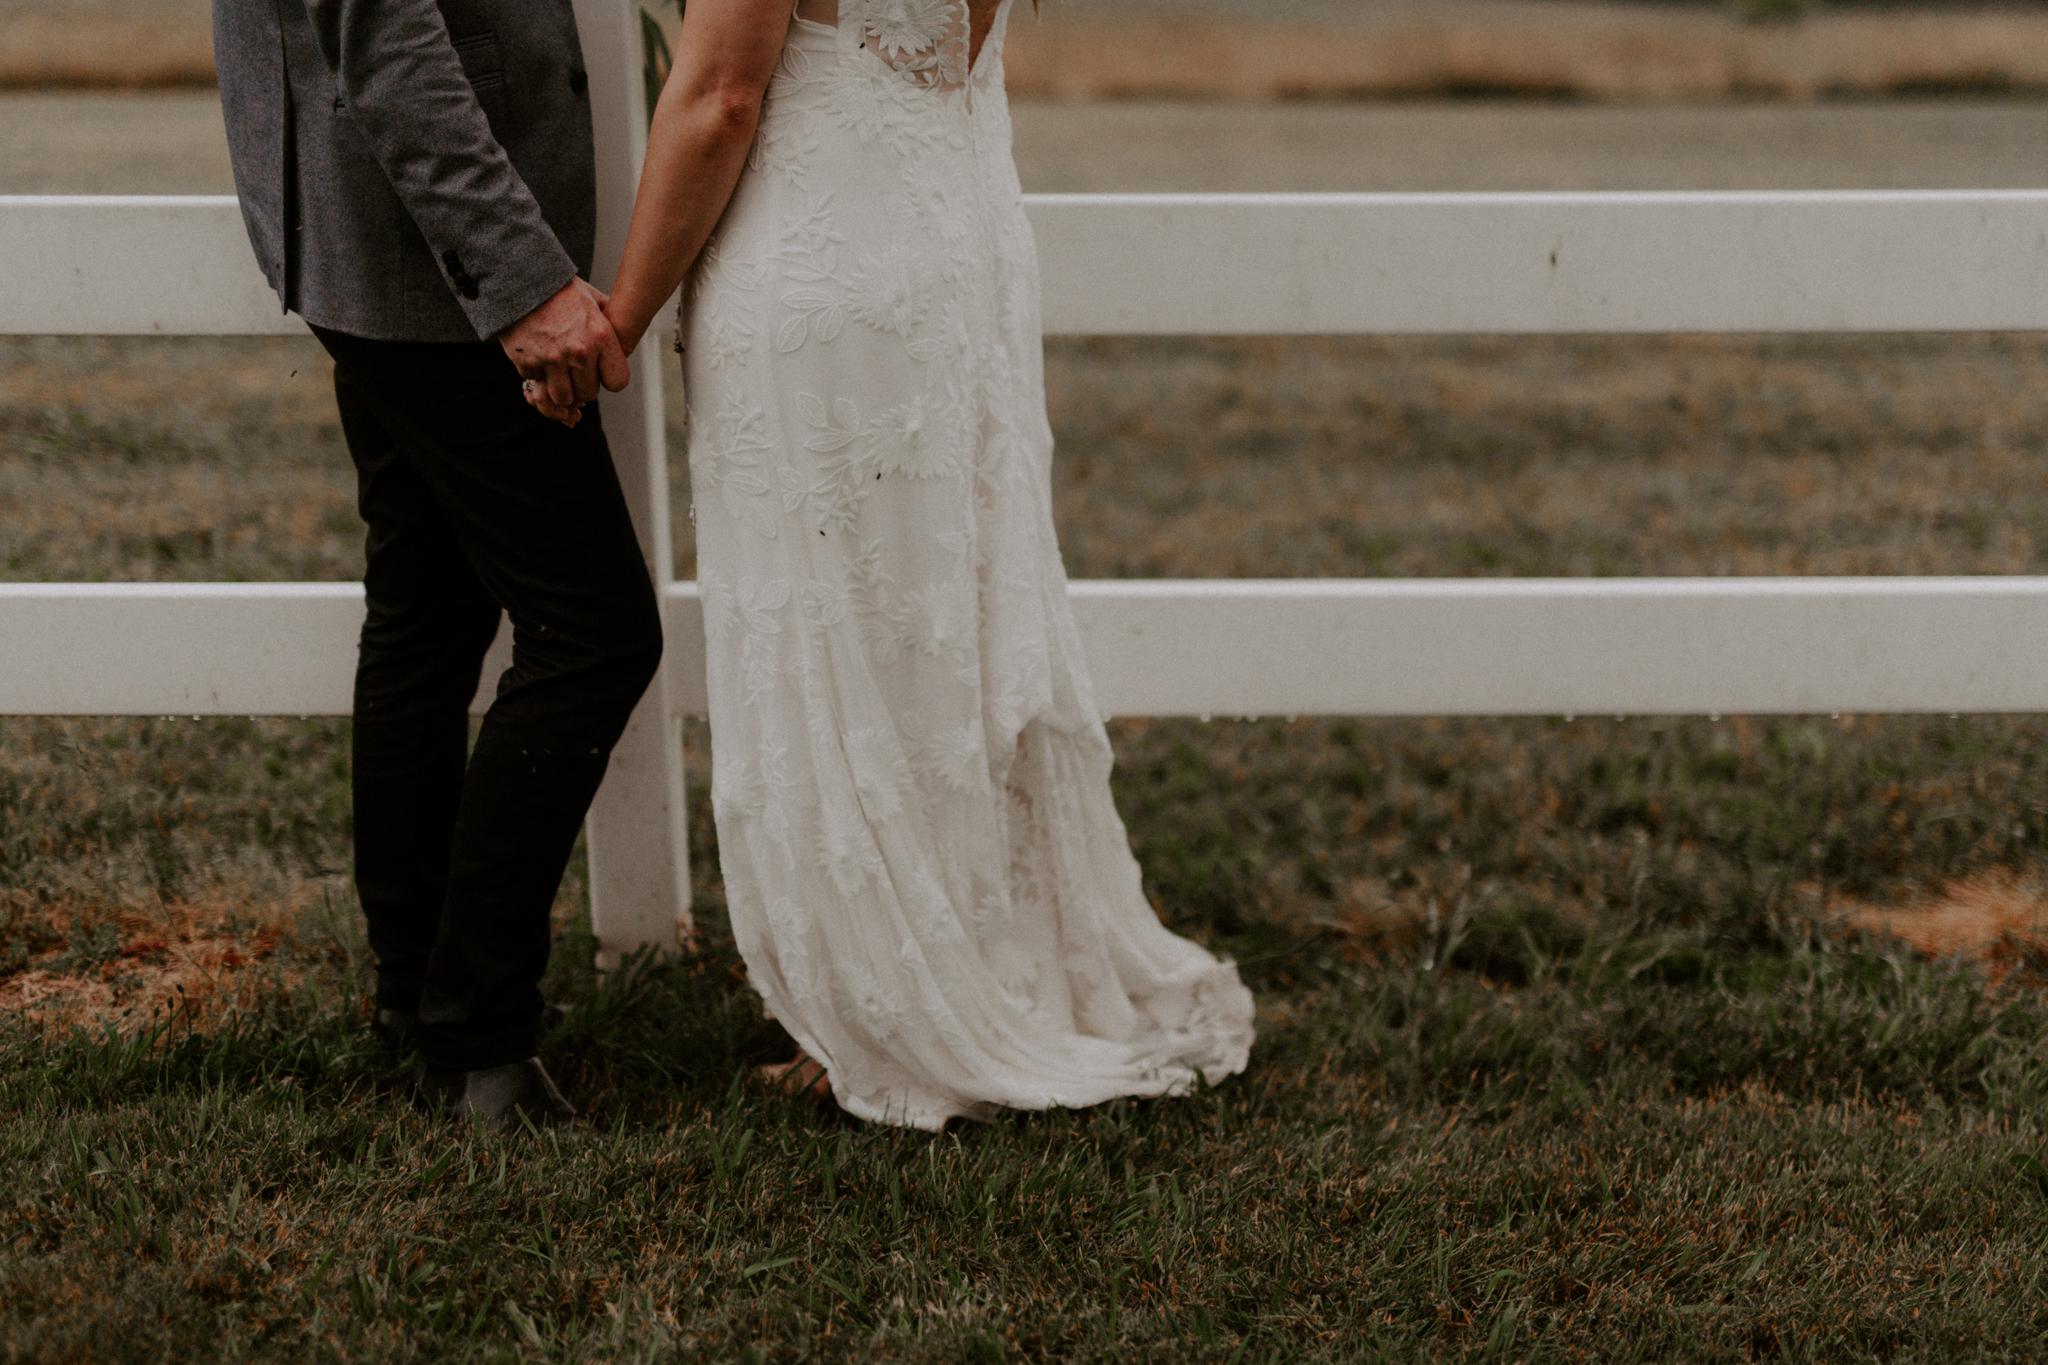 Wandin-Park-Estate-Wedding-Emotions-and-Math-Photography-169.jpg